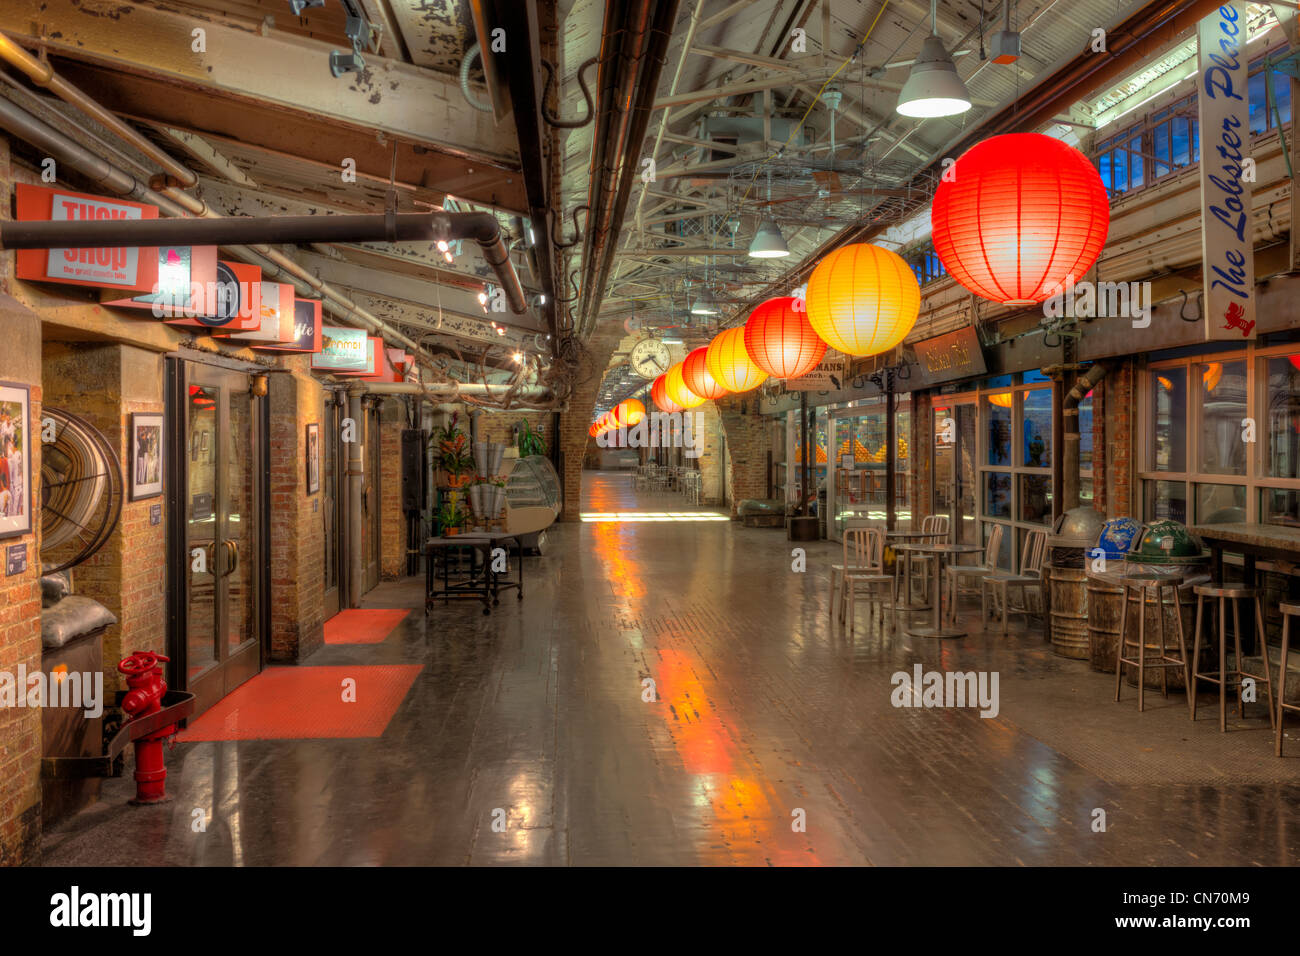 The Interior Of Chelsea Market In New York City Stock Photo